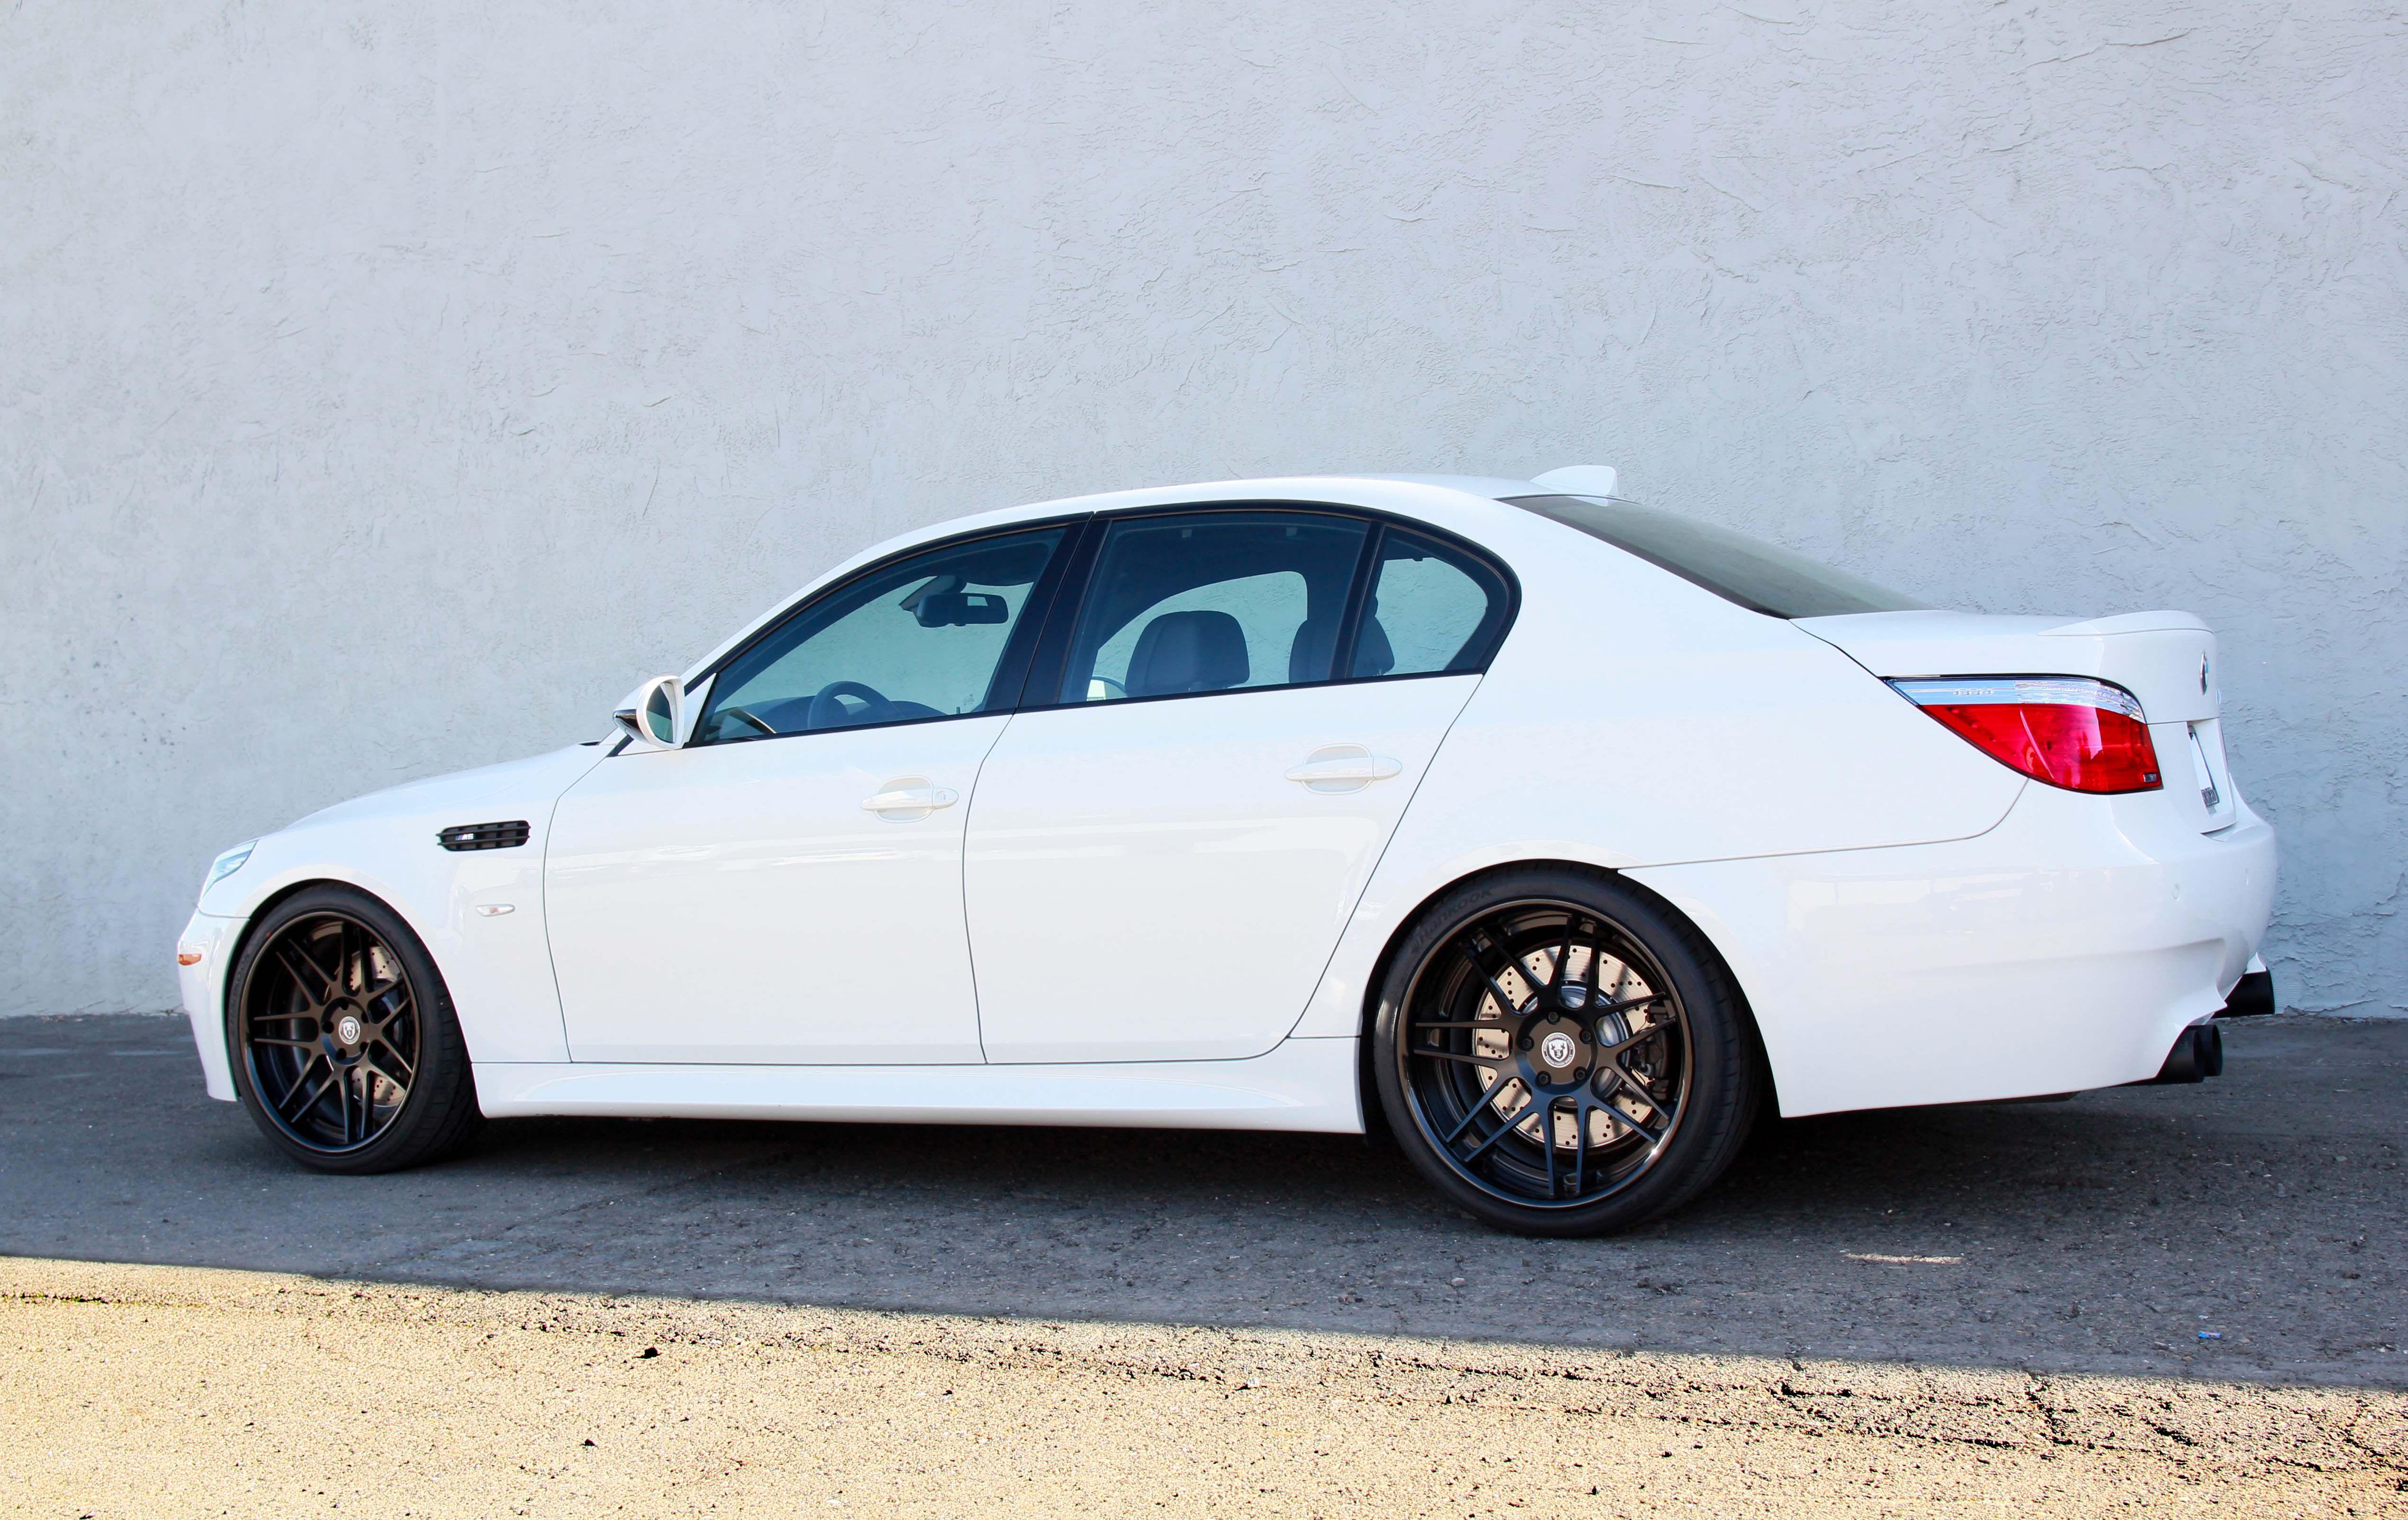 8 Best Mods For E60 Bmw 528i 535i 545i 550i M5 Bmw Sports Cars Luxury Bmw 535